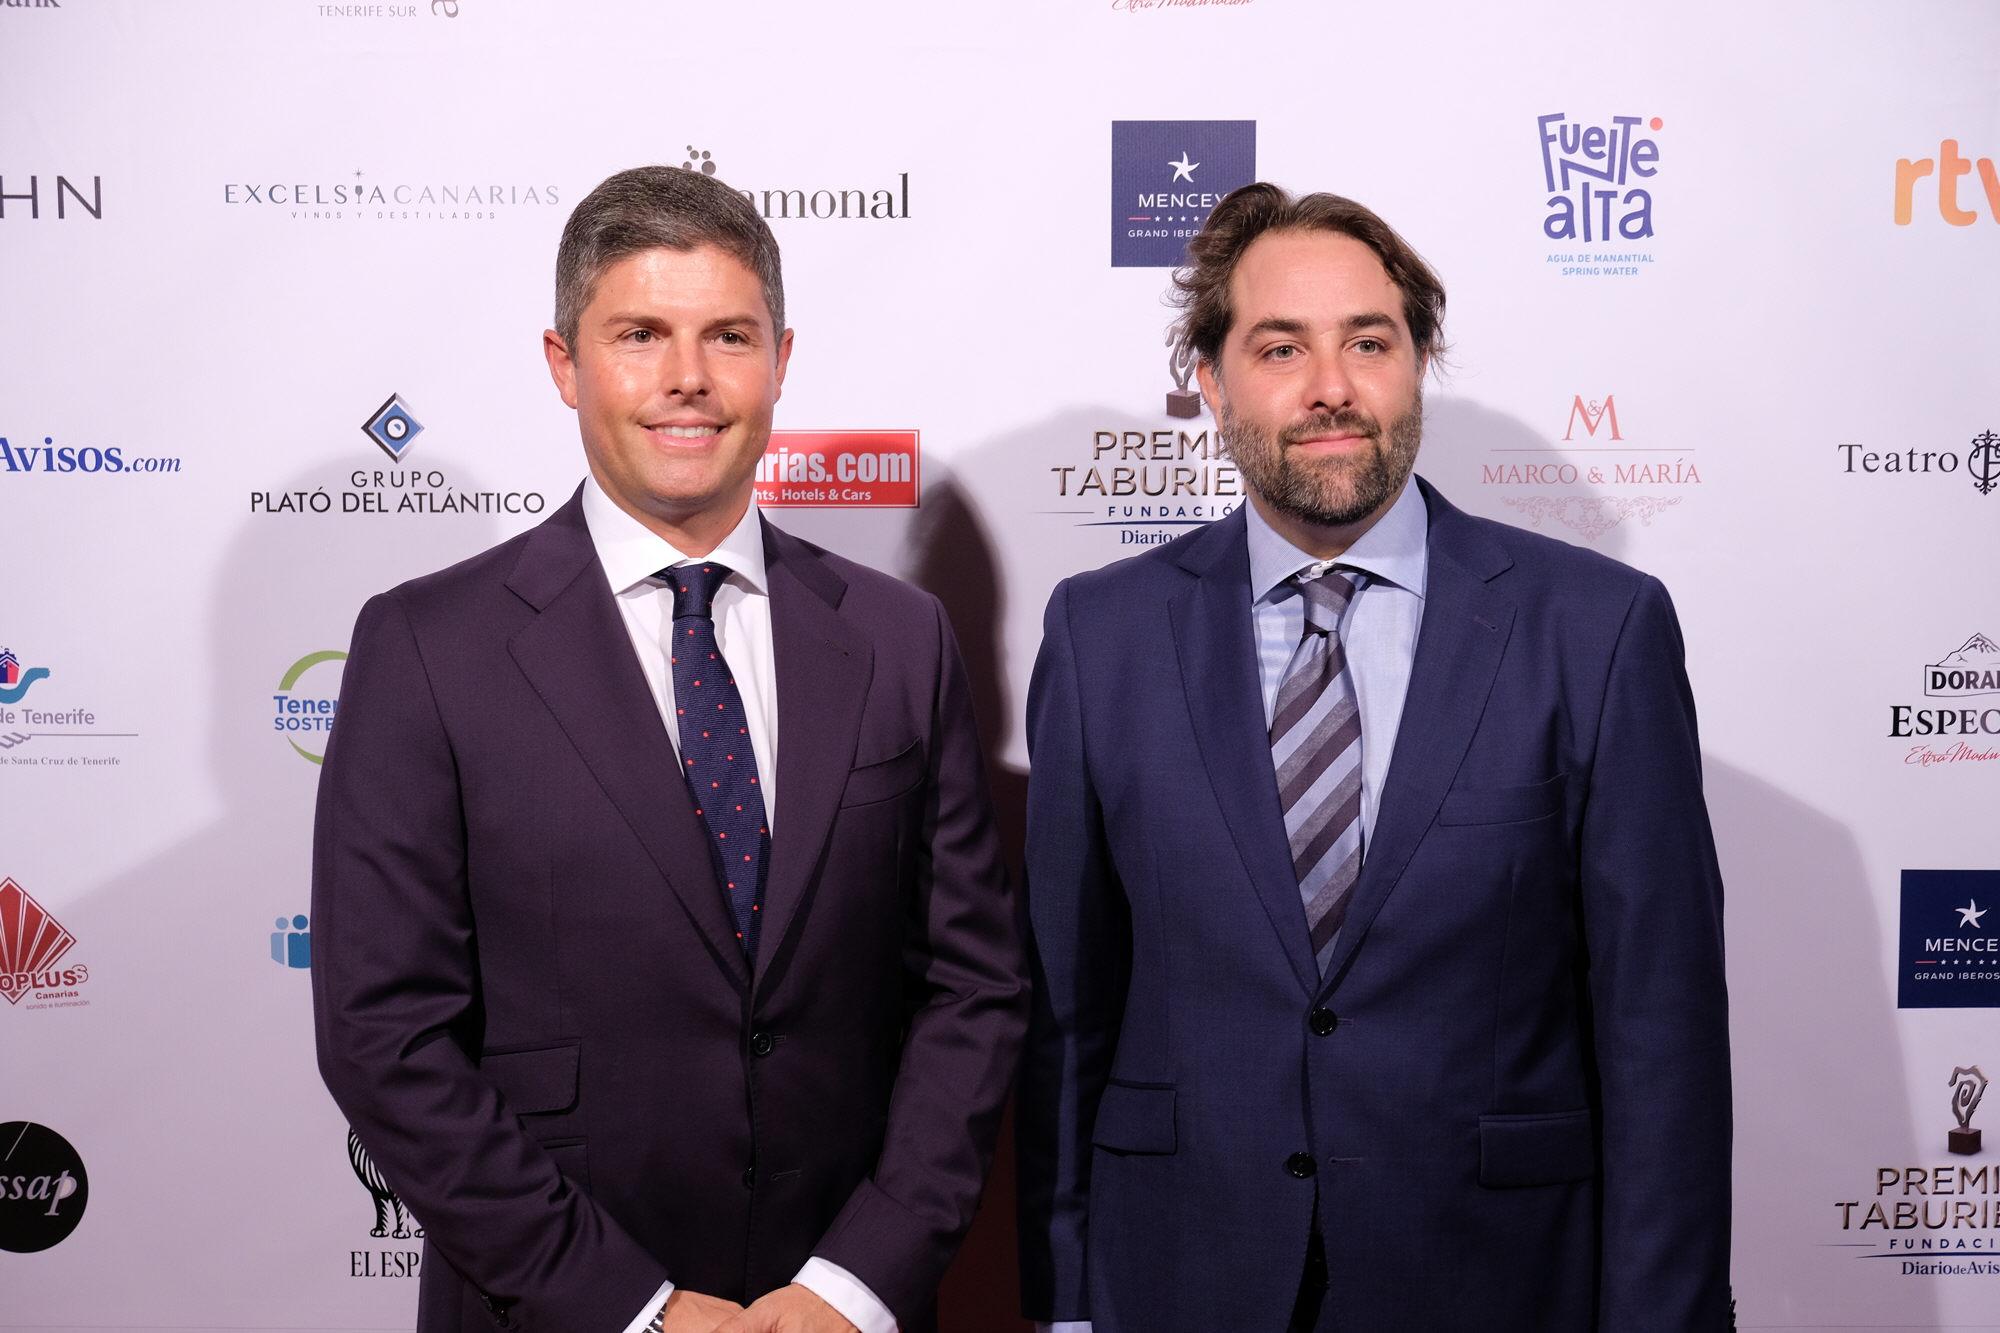 Premios Taburiente 2018